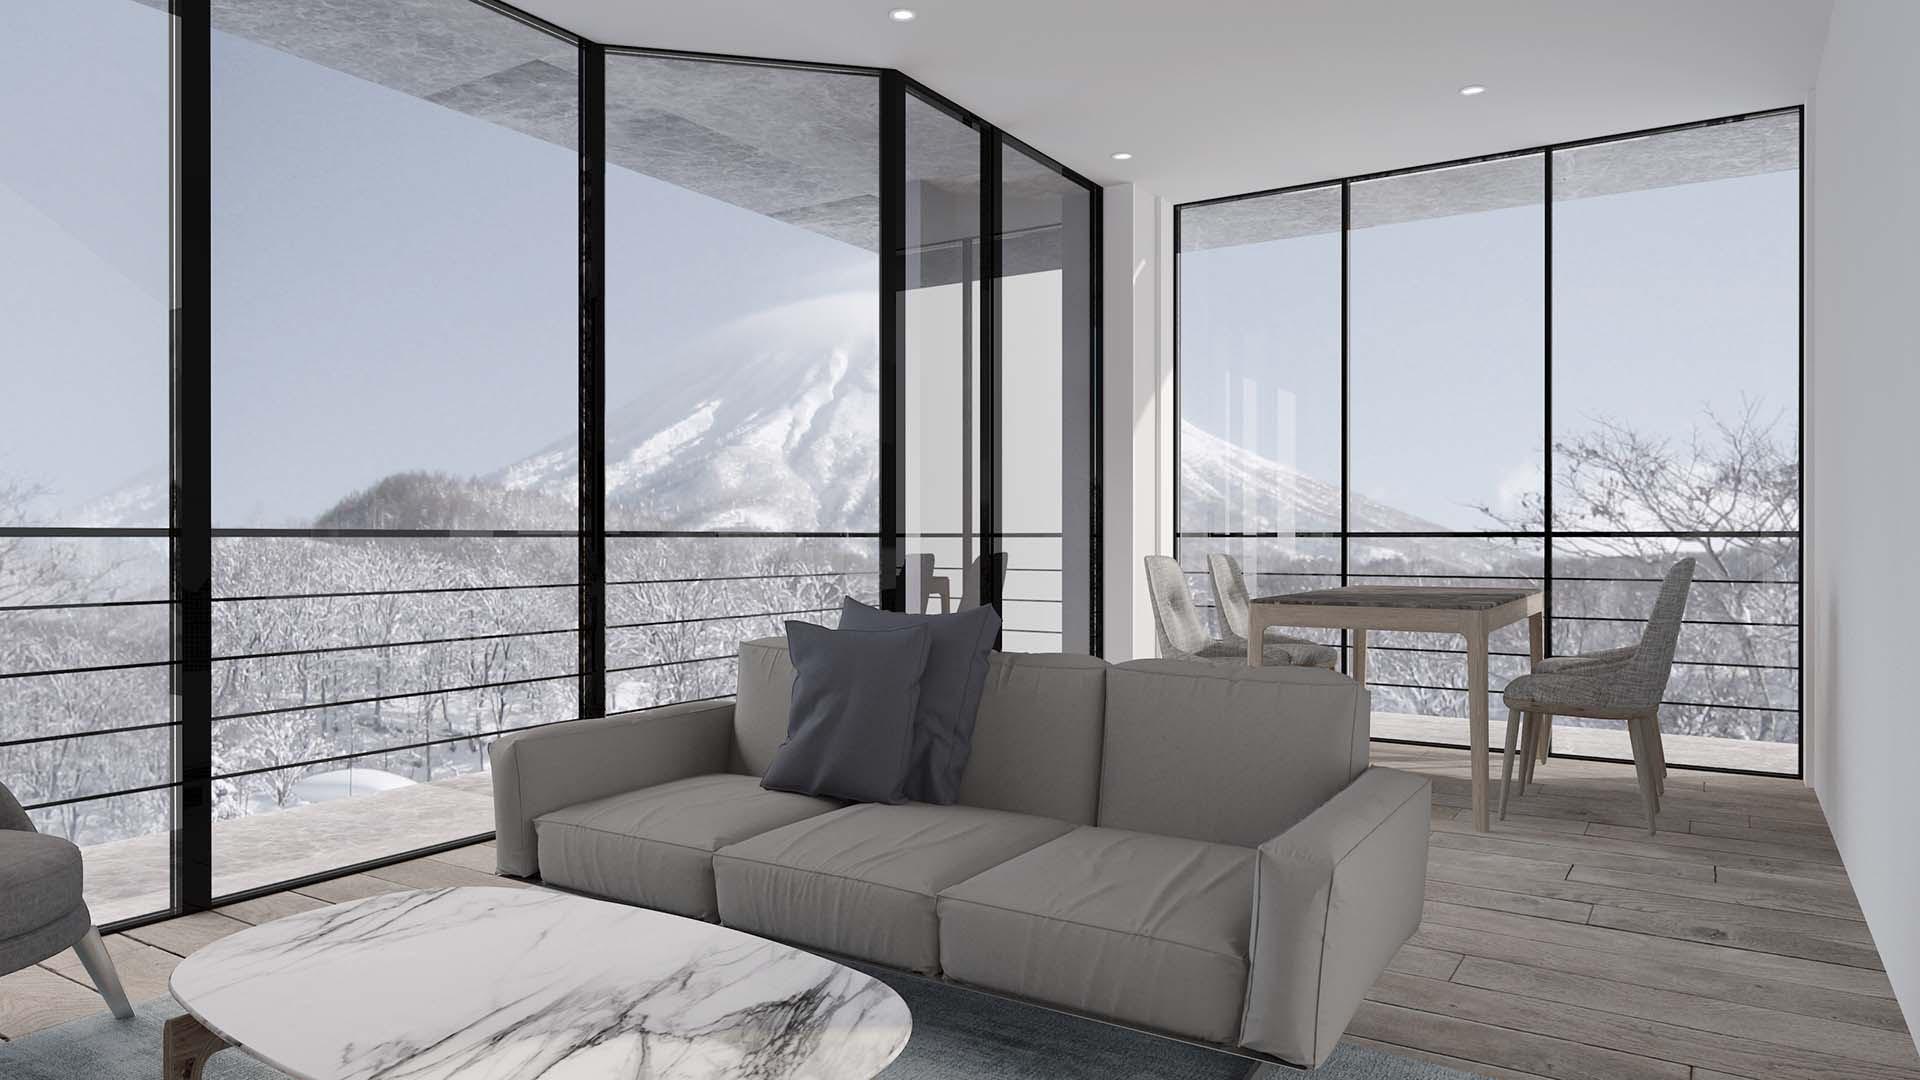 Shinka 2 bedroom living